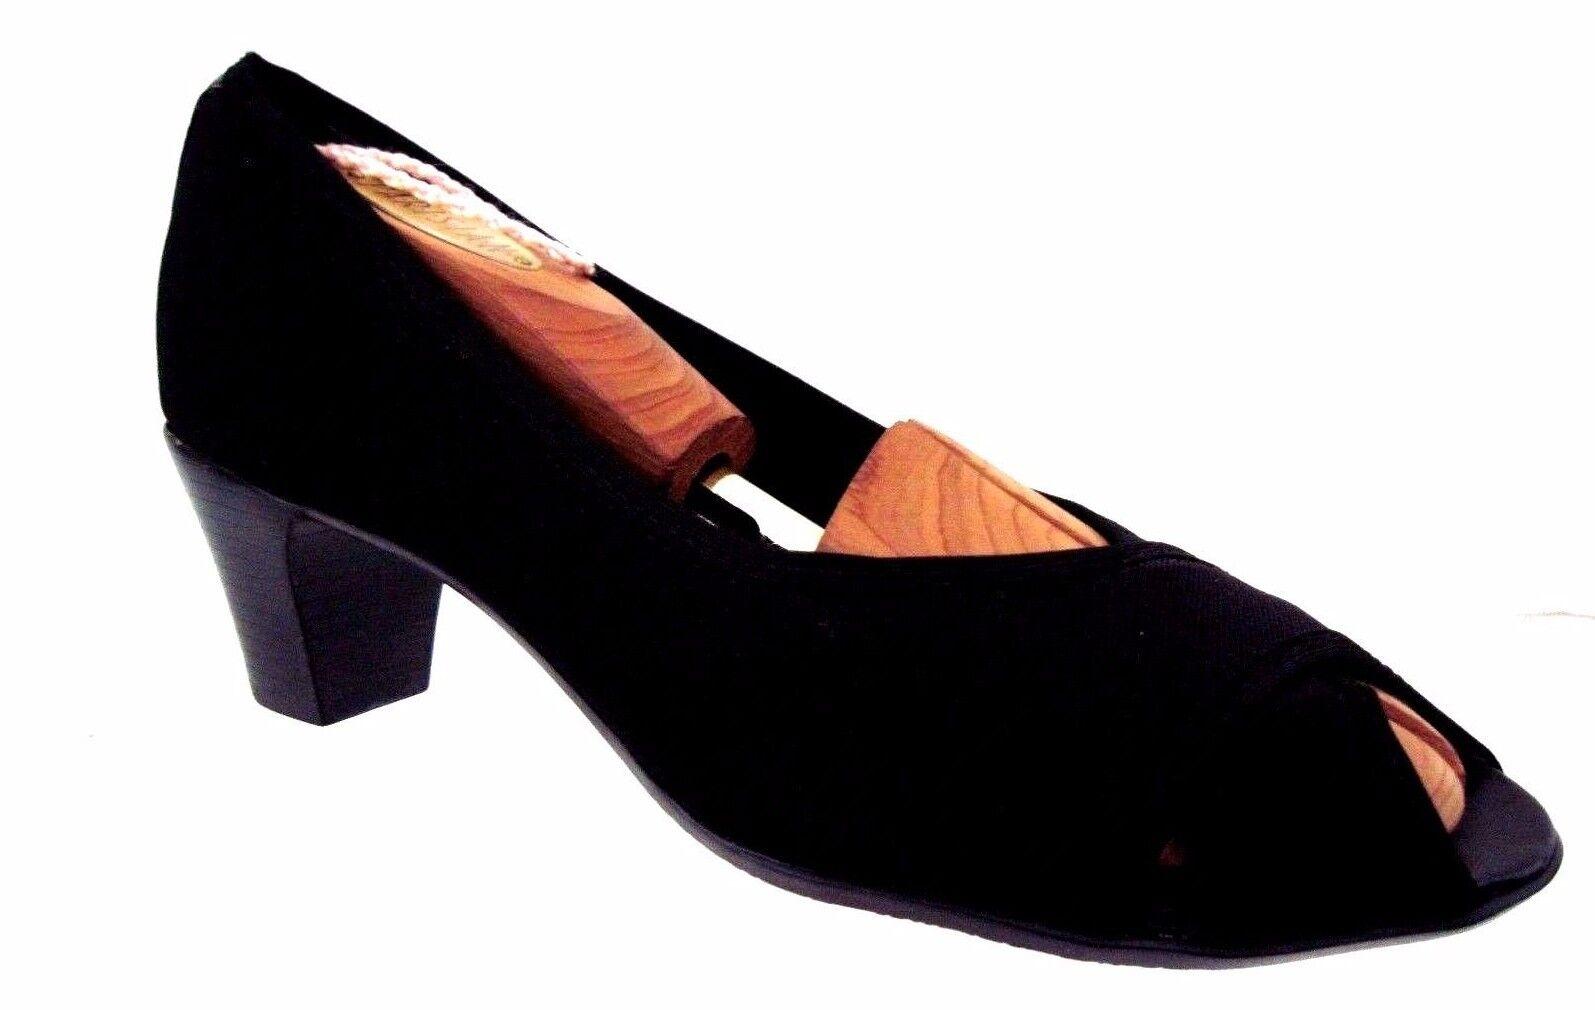 MUNRO AMERICAN Black Black Black Fabric Black Patent Trim Peep Toe Pumps Heels Size 7 N c7d83d